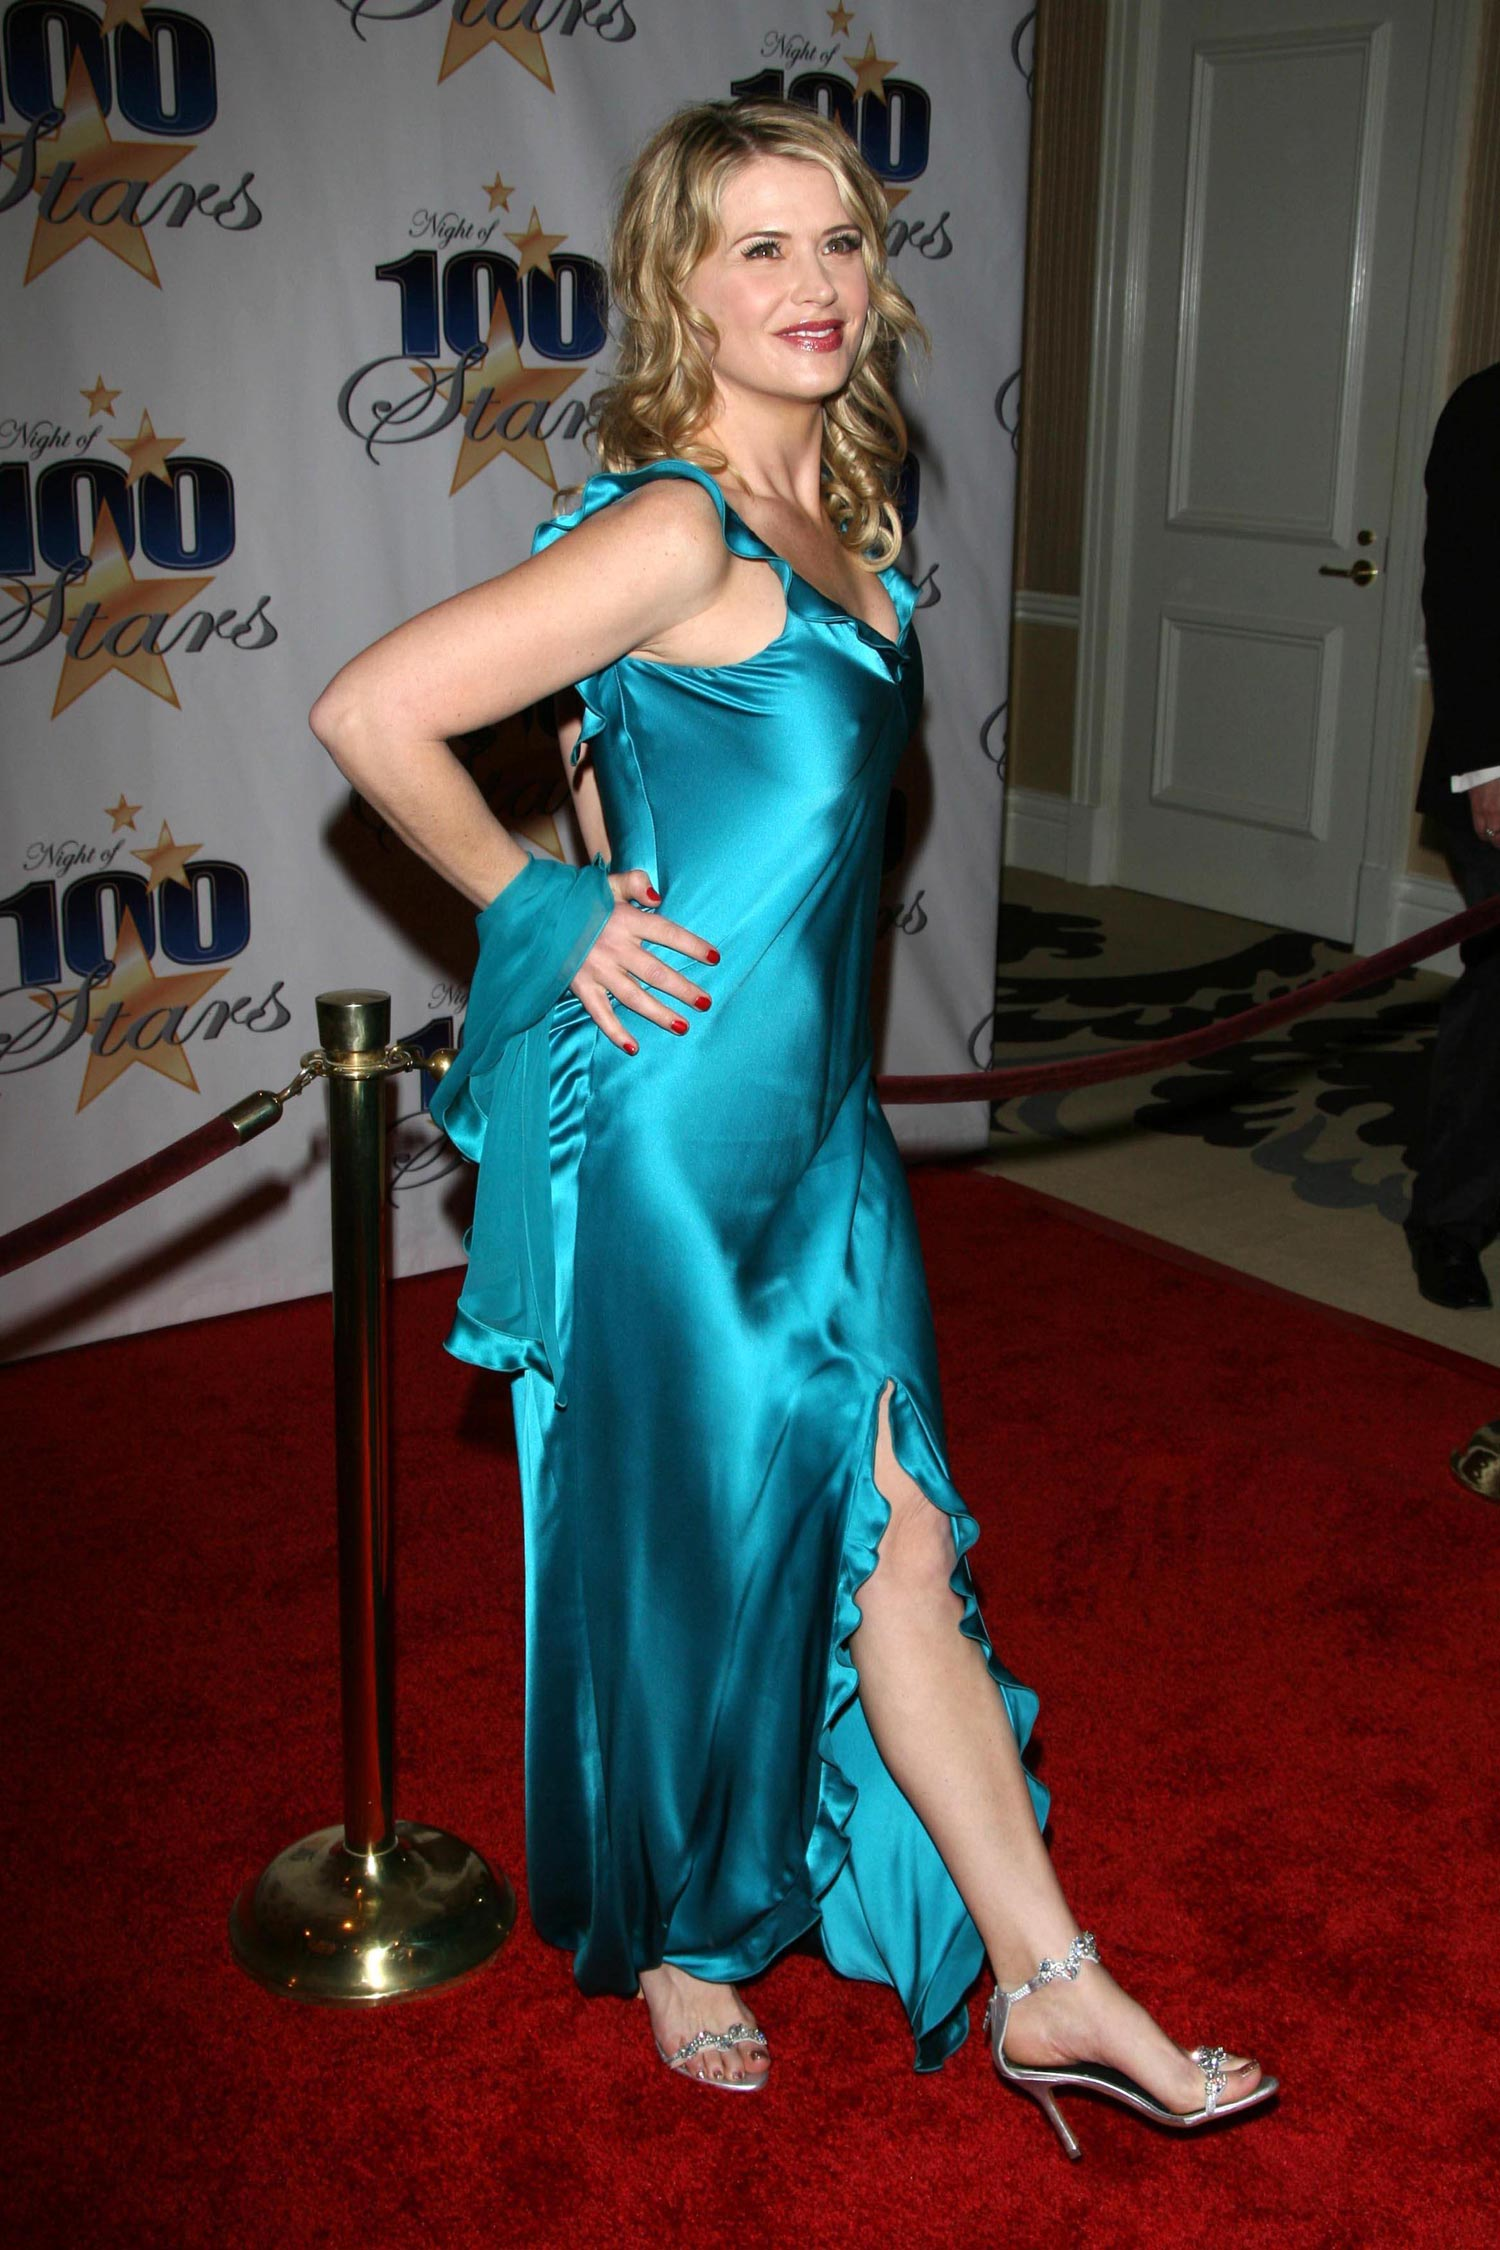 Legs Kristy Swanson nude (69 pictures) Hot, Facebook, bra